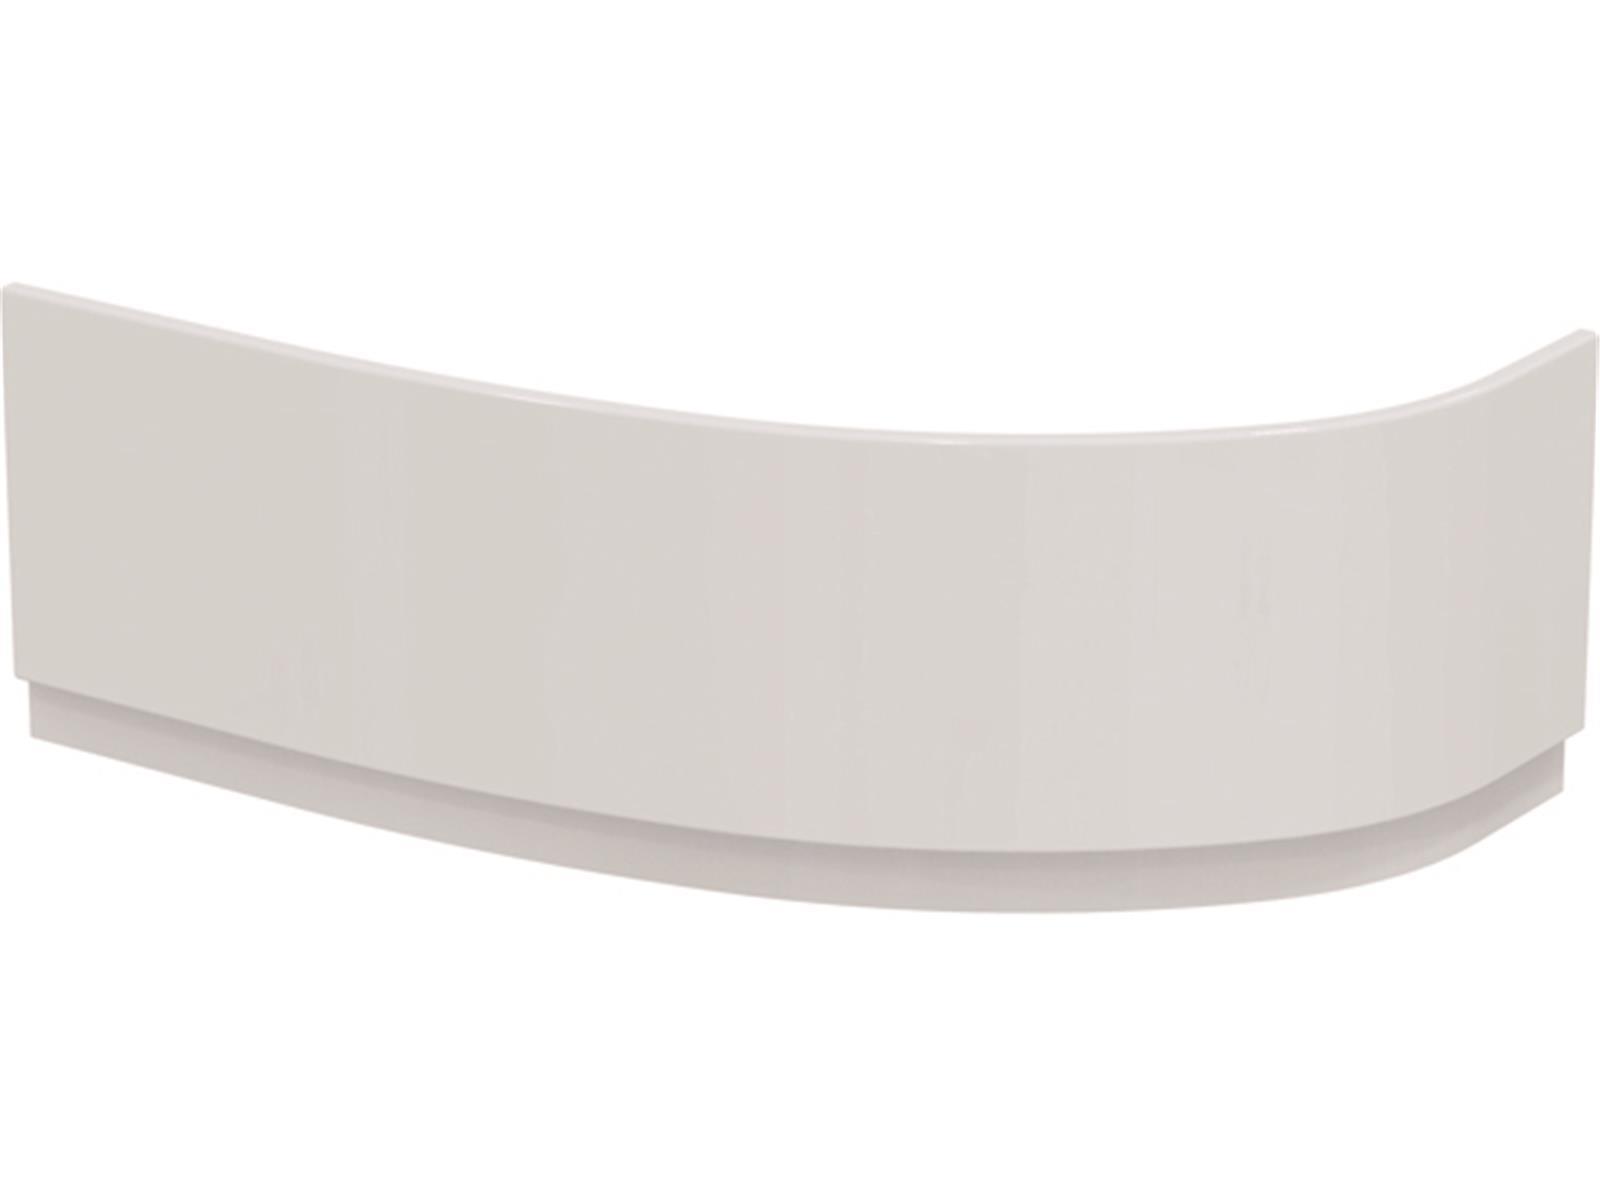 IS Acryl-Schürze Hotline Neu 1600mm asymmetrisch links Weiß